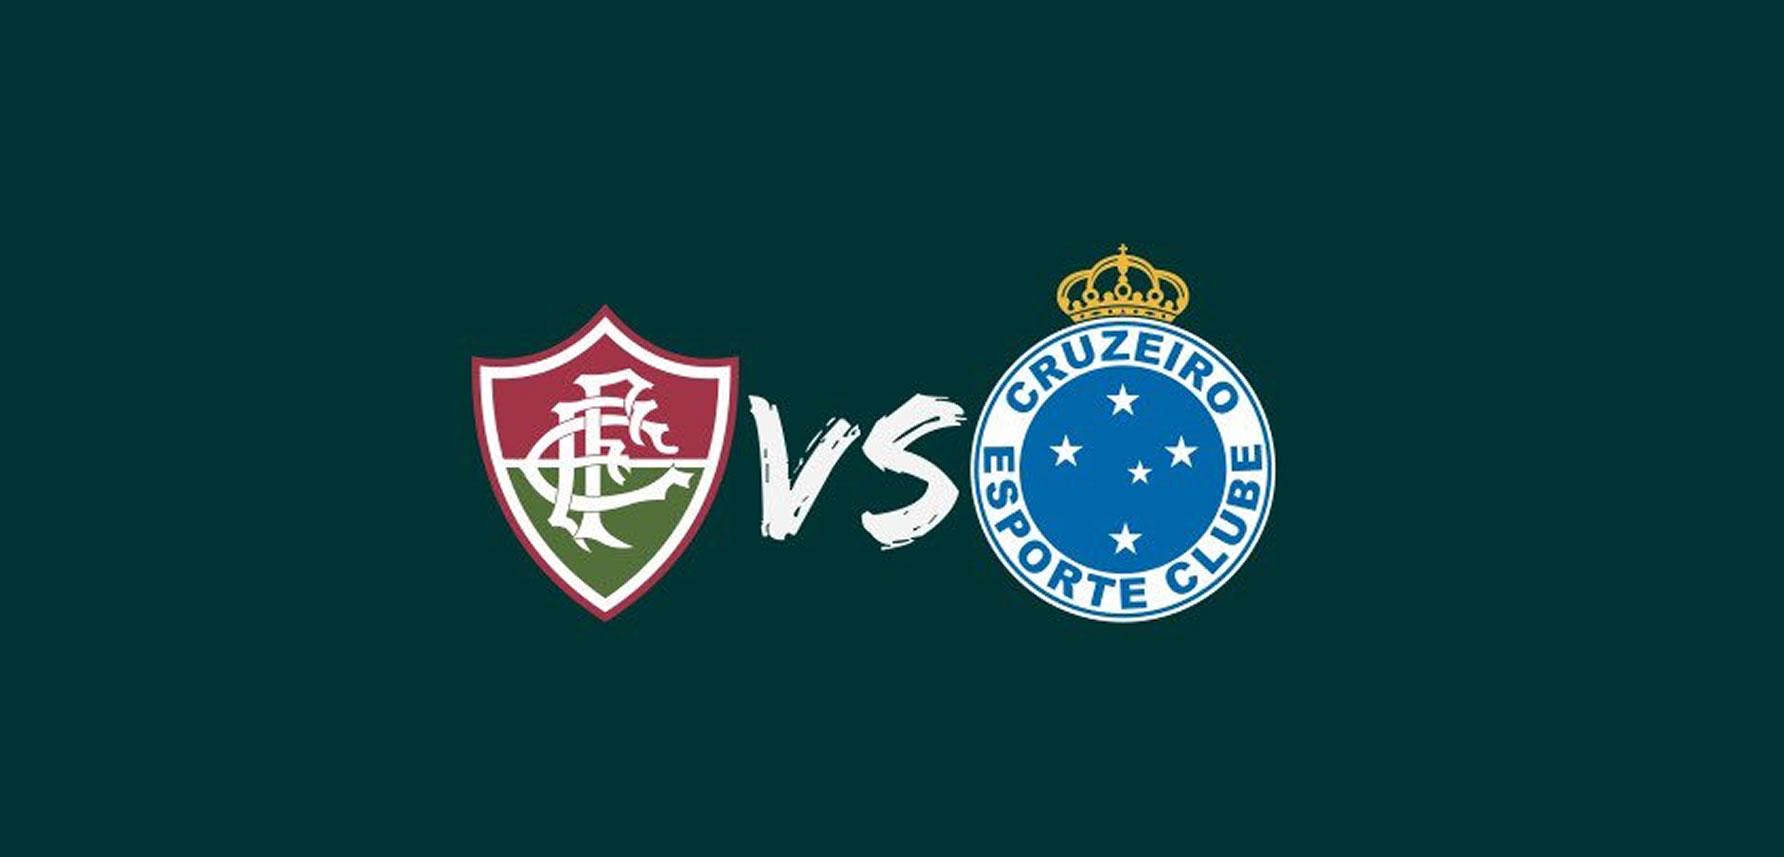 flu x cruzeiro ao vivo hoje copa do Brasil